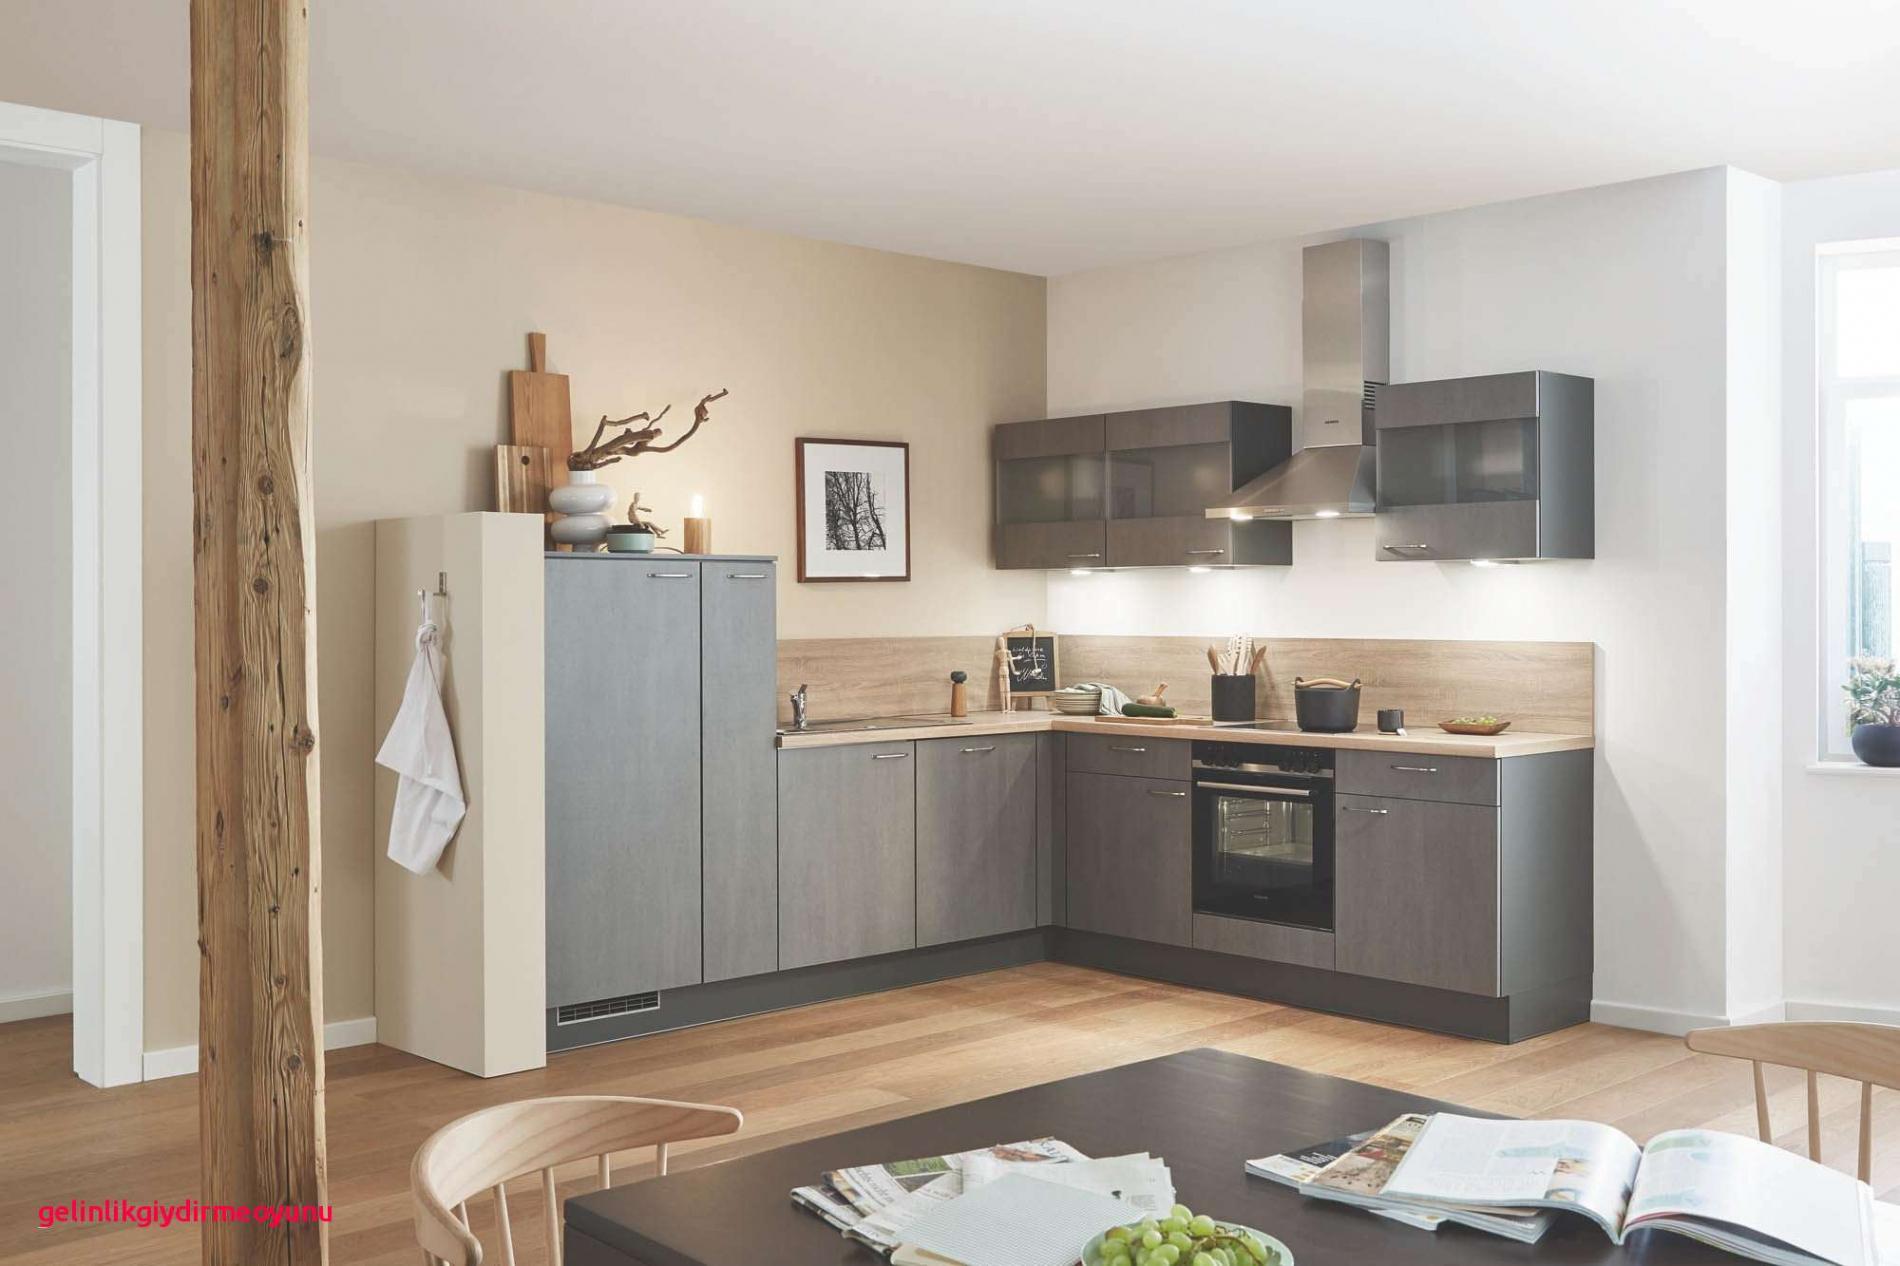 45 luxus deko ideen kuche galerie kuchen fur dachgeschosswohnungen kuchen fur dachgeschosswohnungen 6